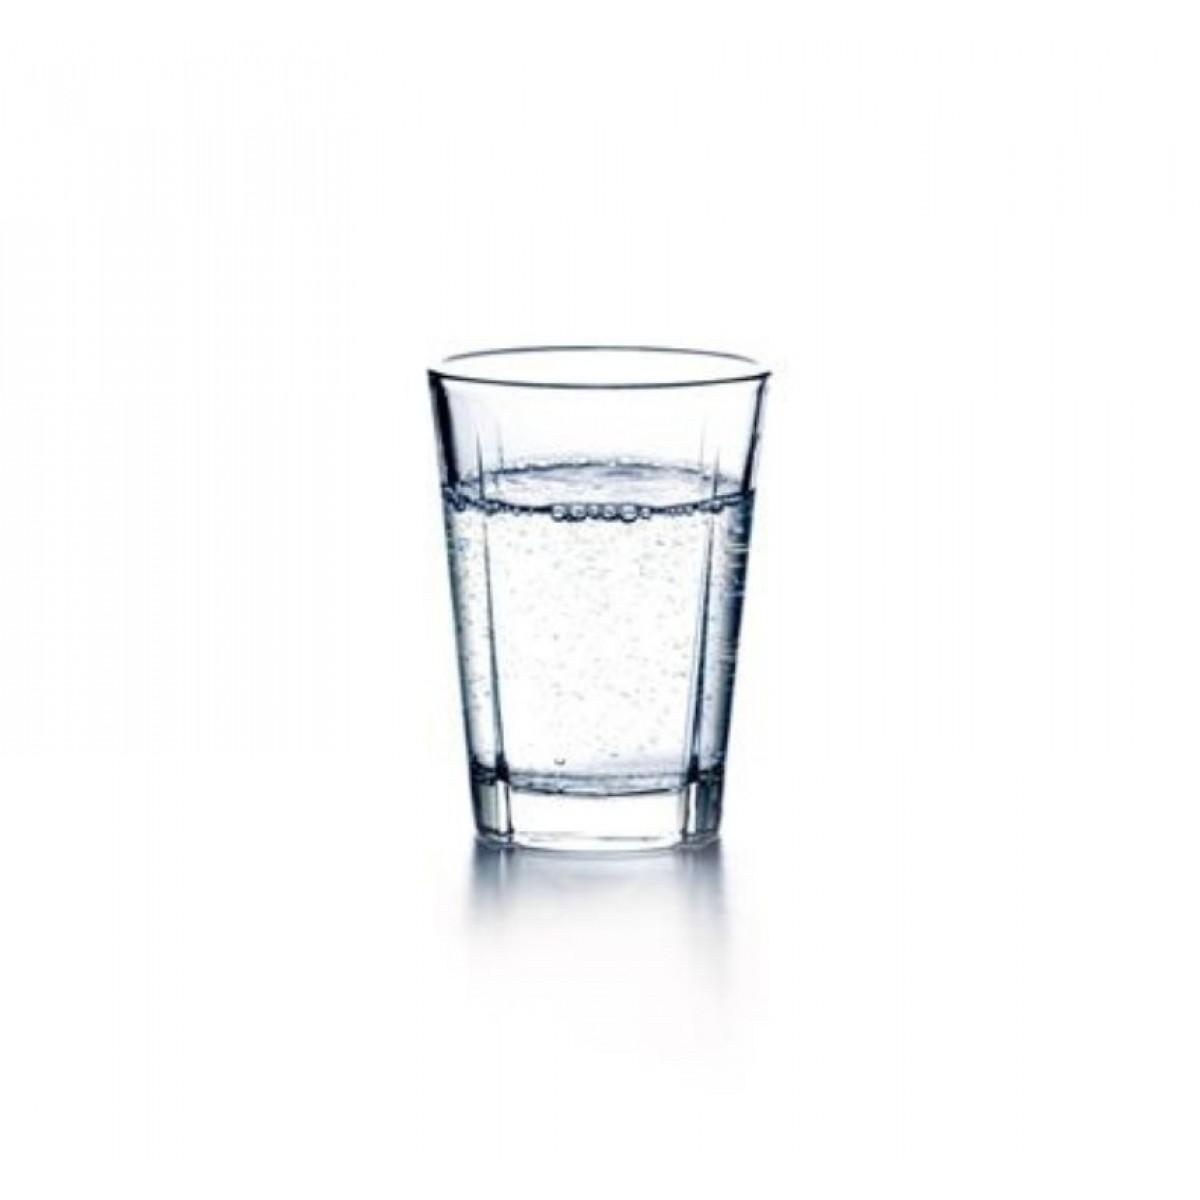 ROSENDAHL Grand Cru vandglas 6 stk.